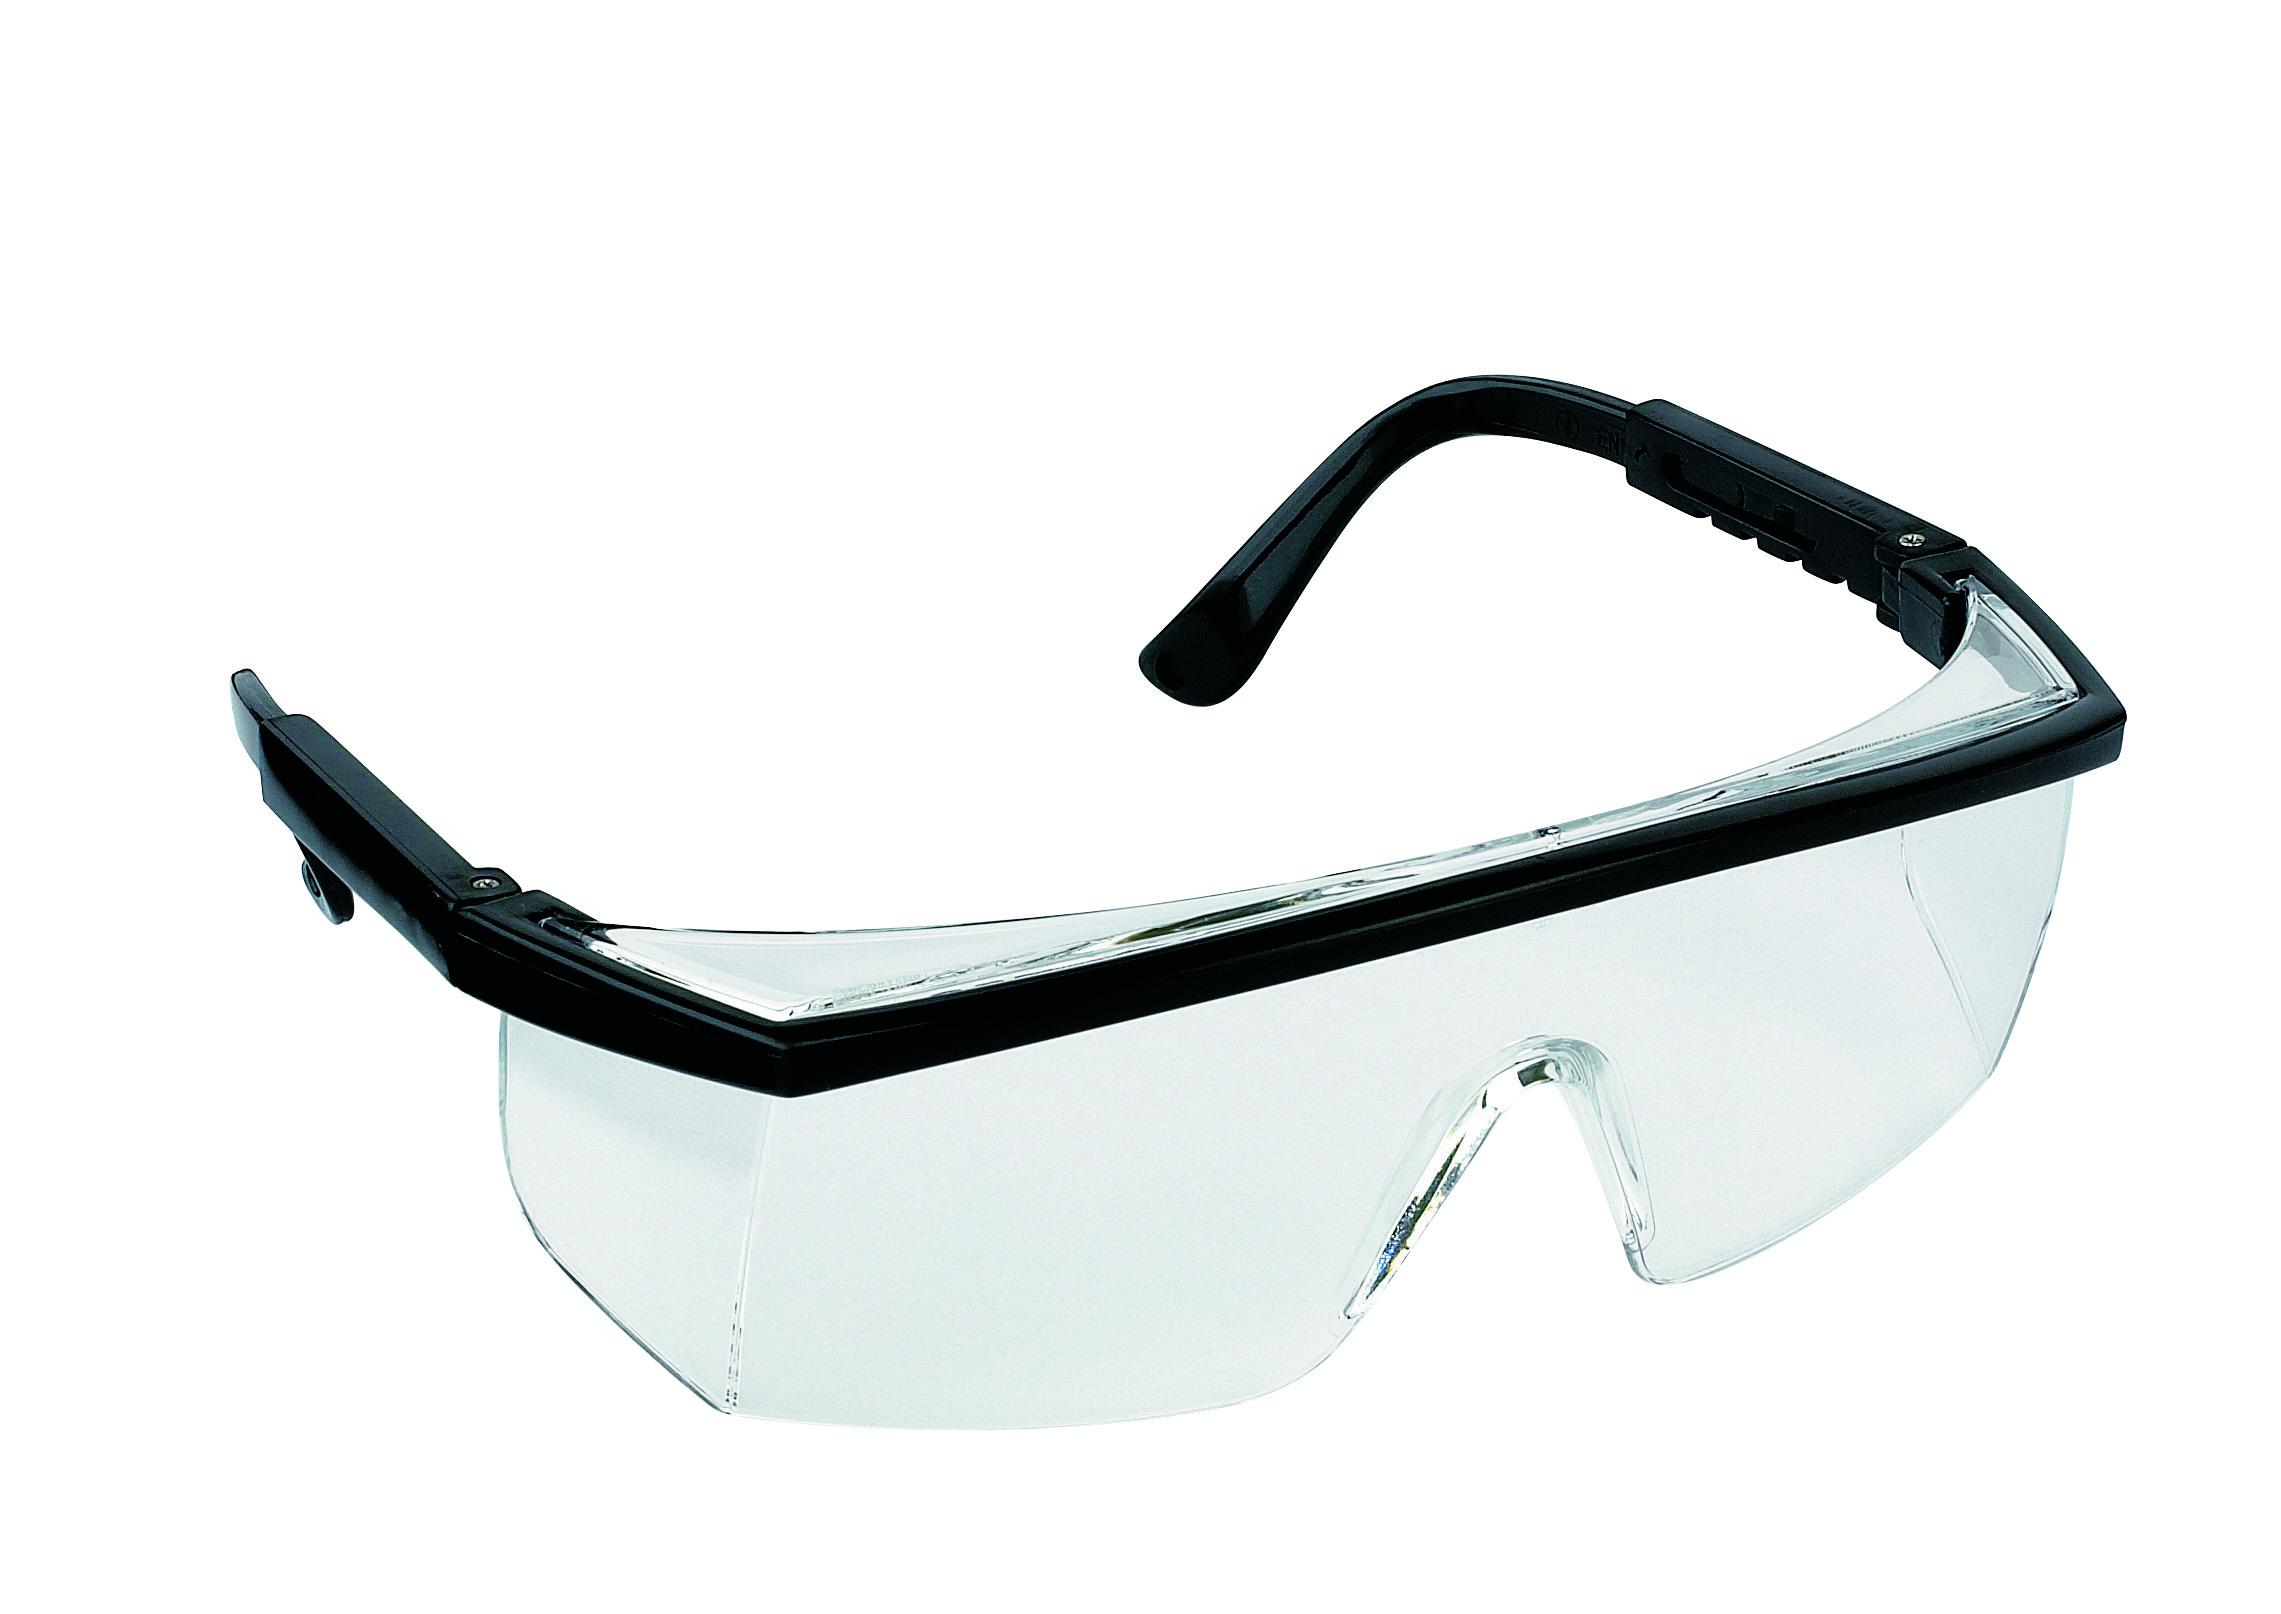 Proforce Eye & Face Protection Safety Wraparound Spectacles